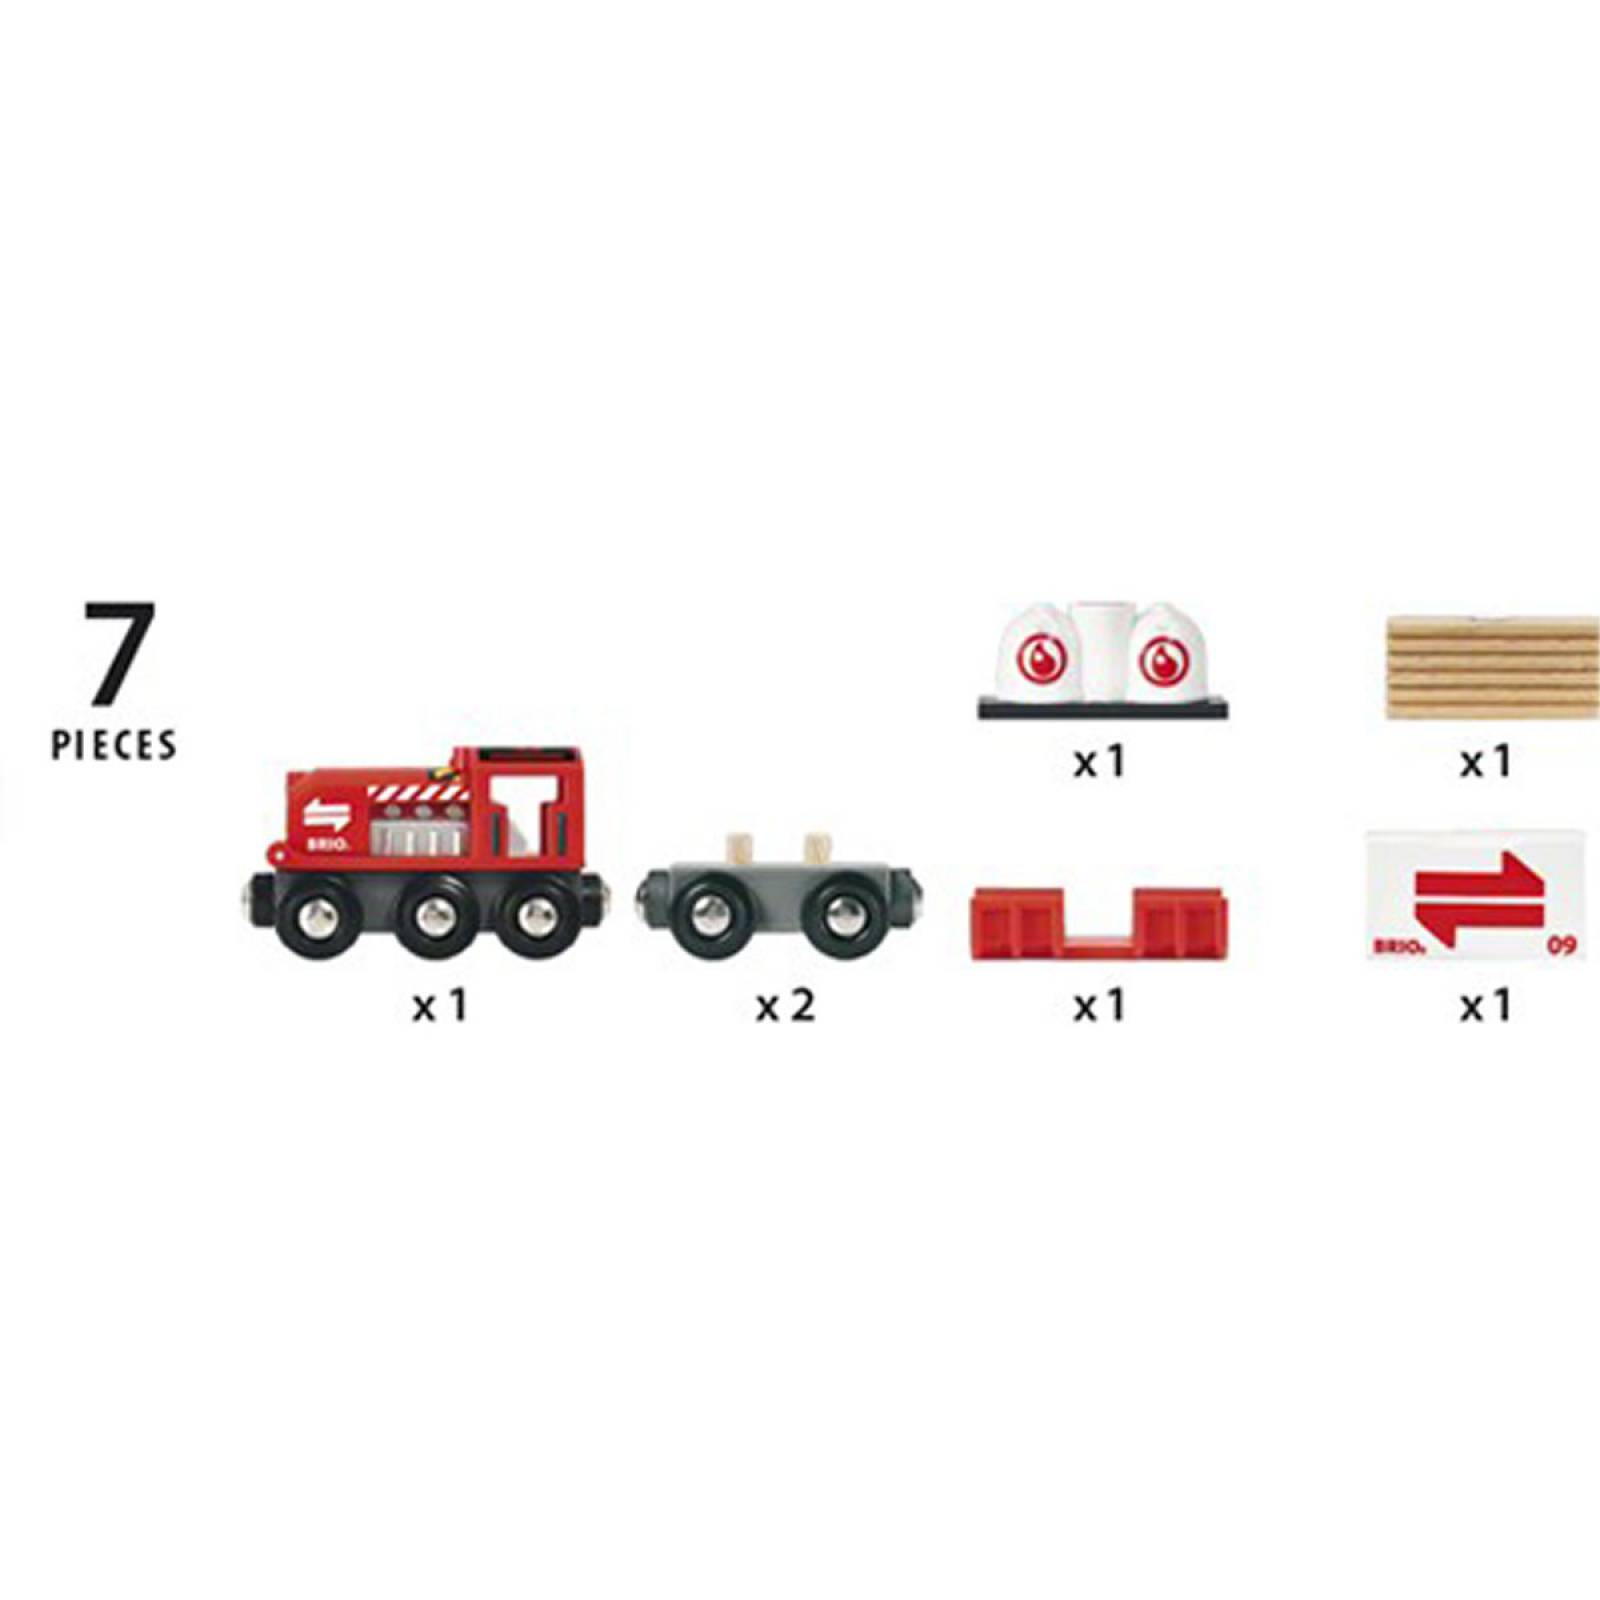 Cargo Train BRIO Wooden Railway Age 3+ thumbnails